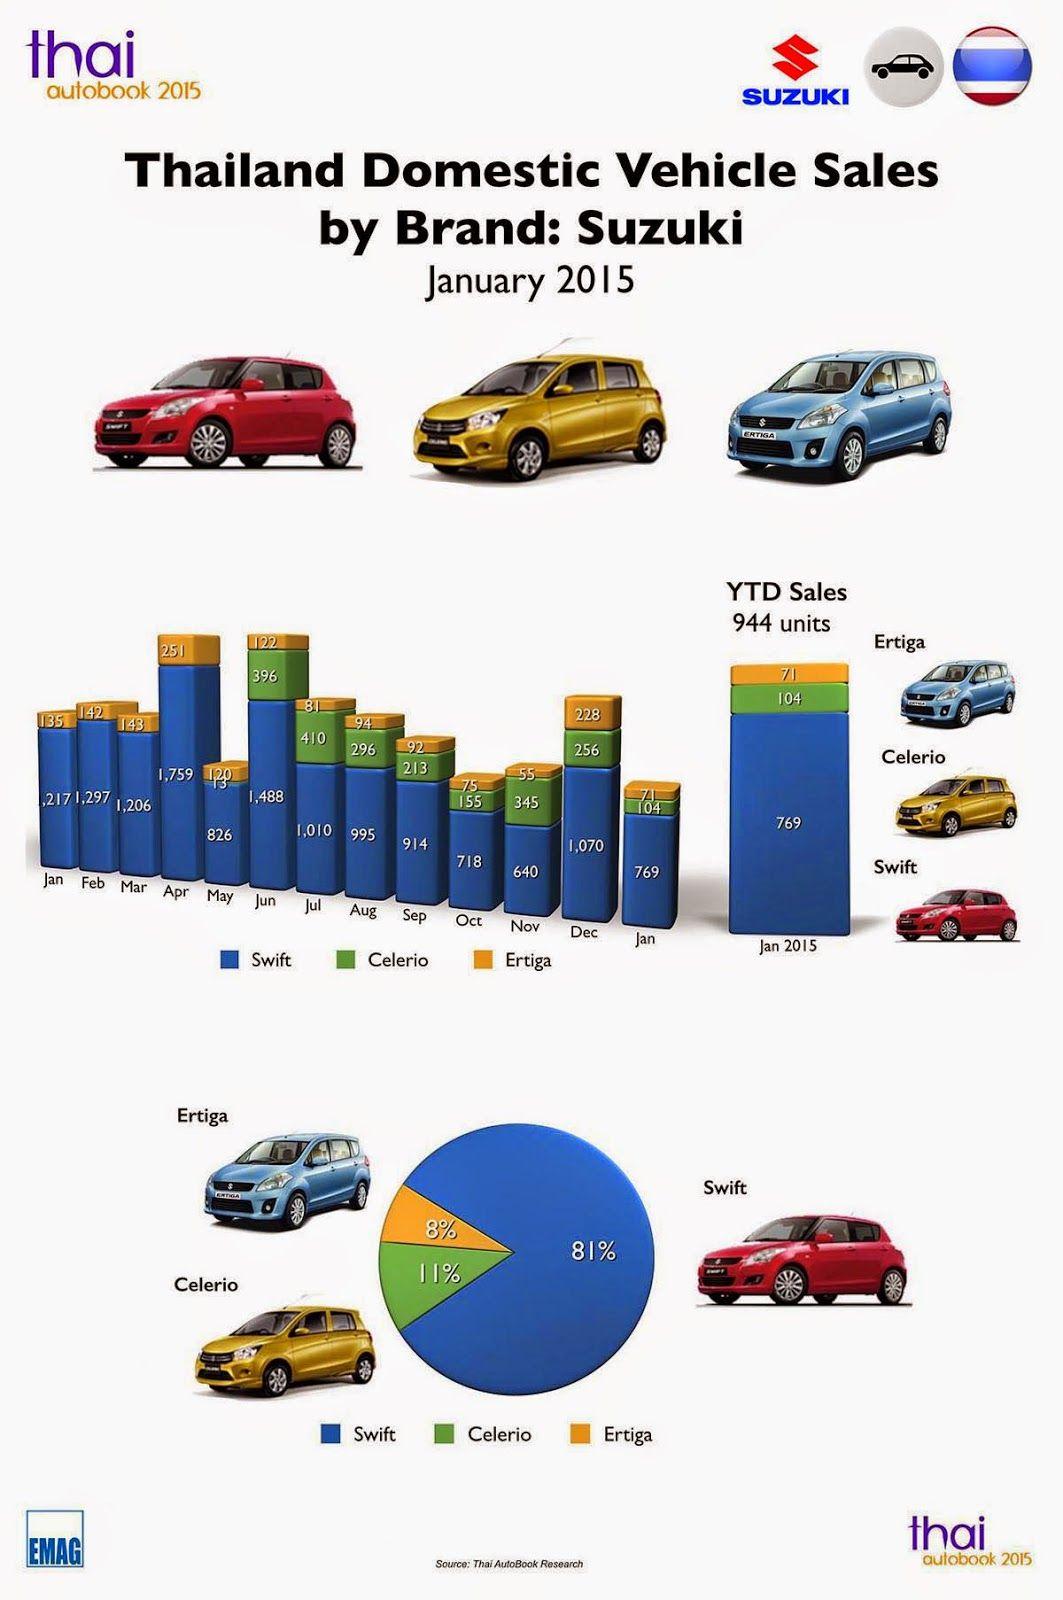 Thai Autobook Infographic Thailand Car Sales January 2015 Suzuki